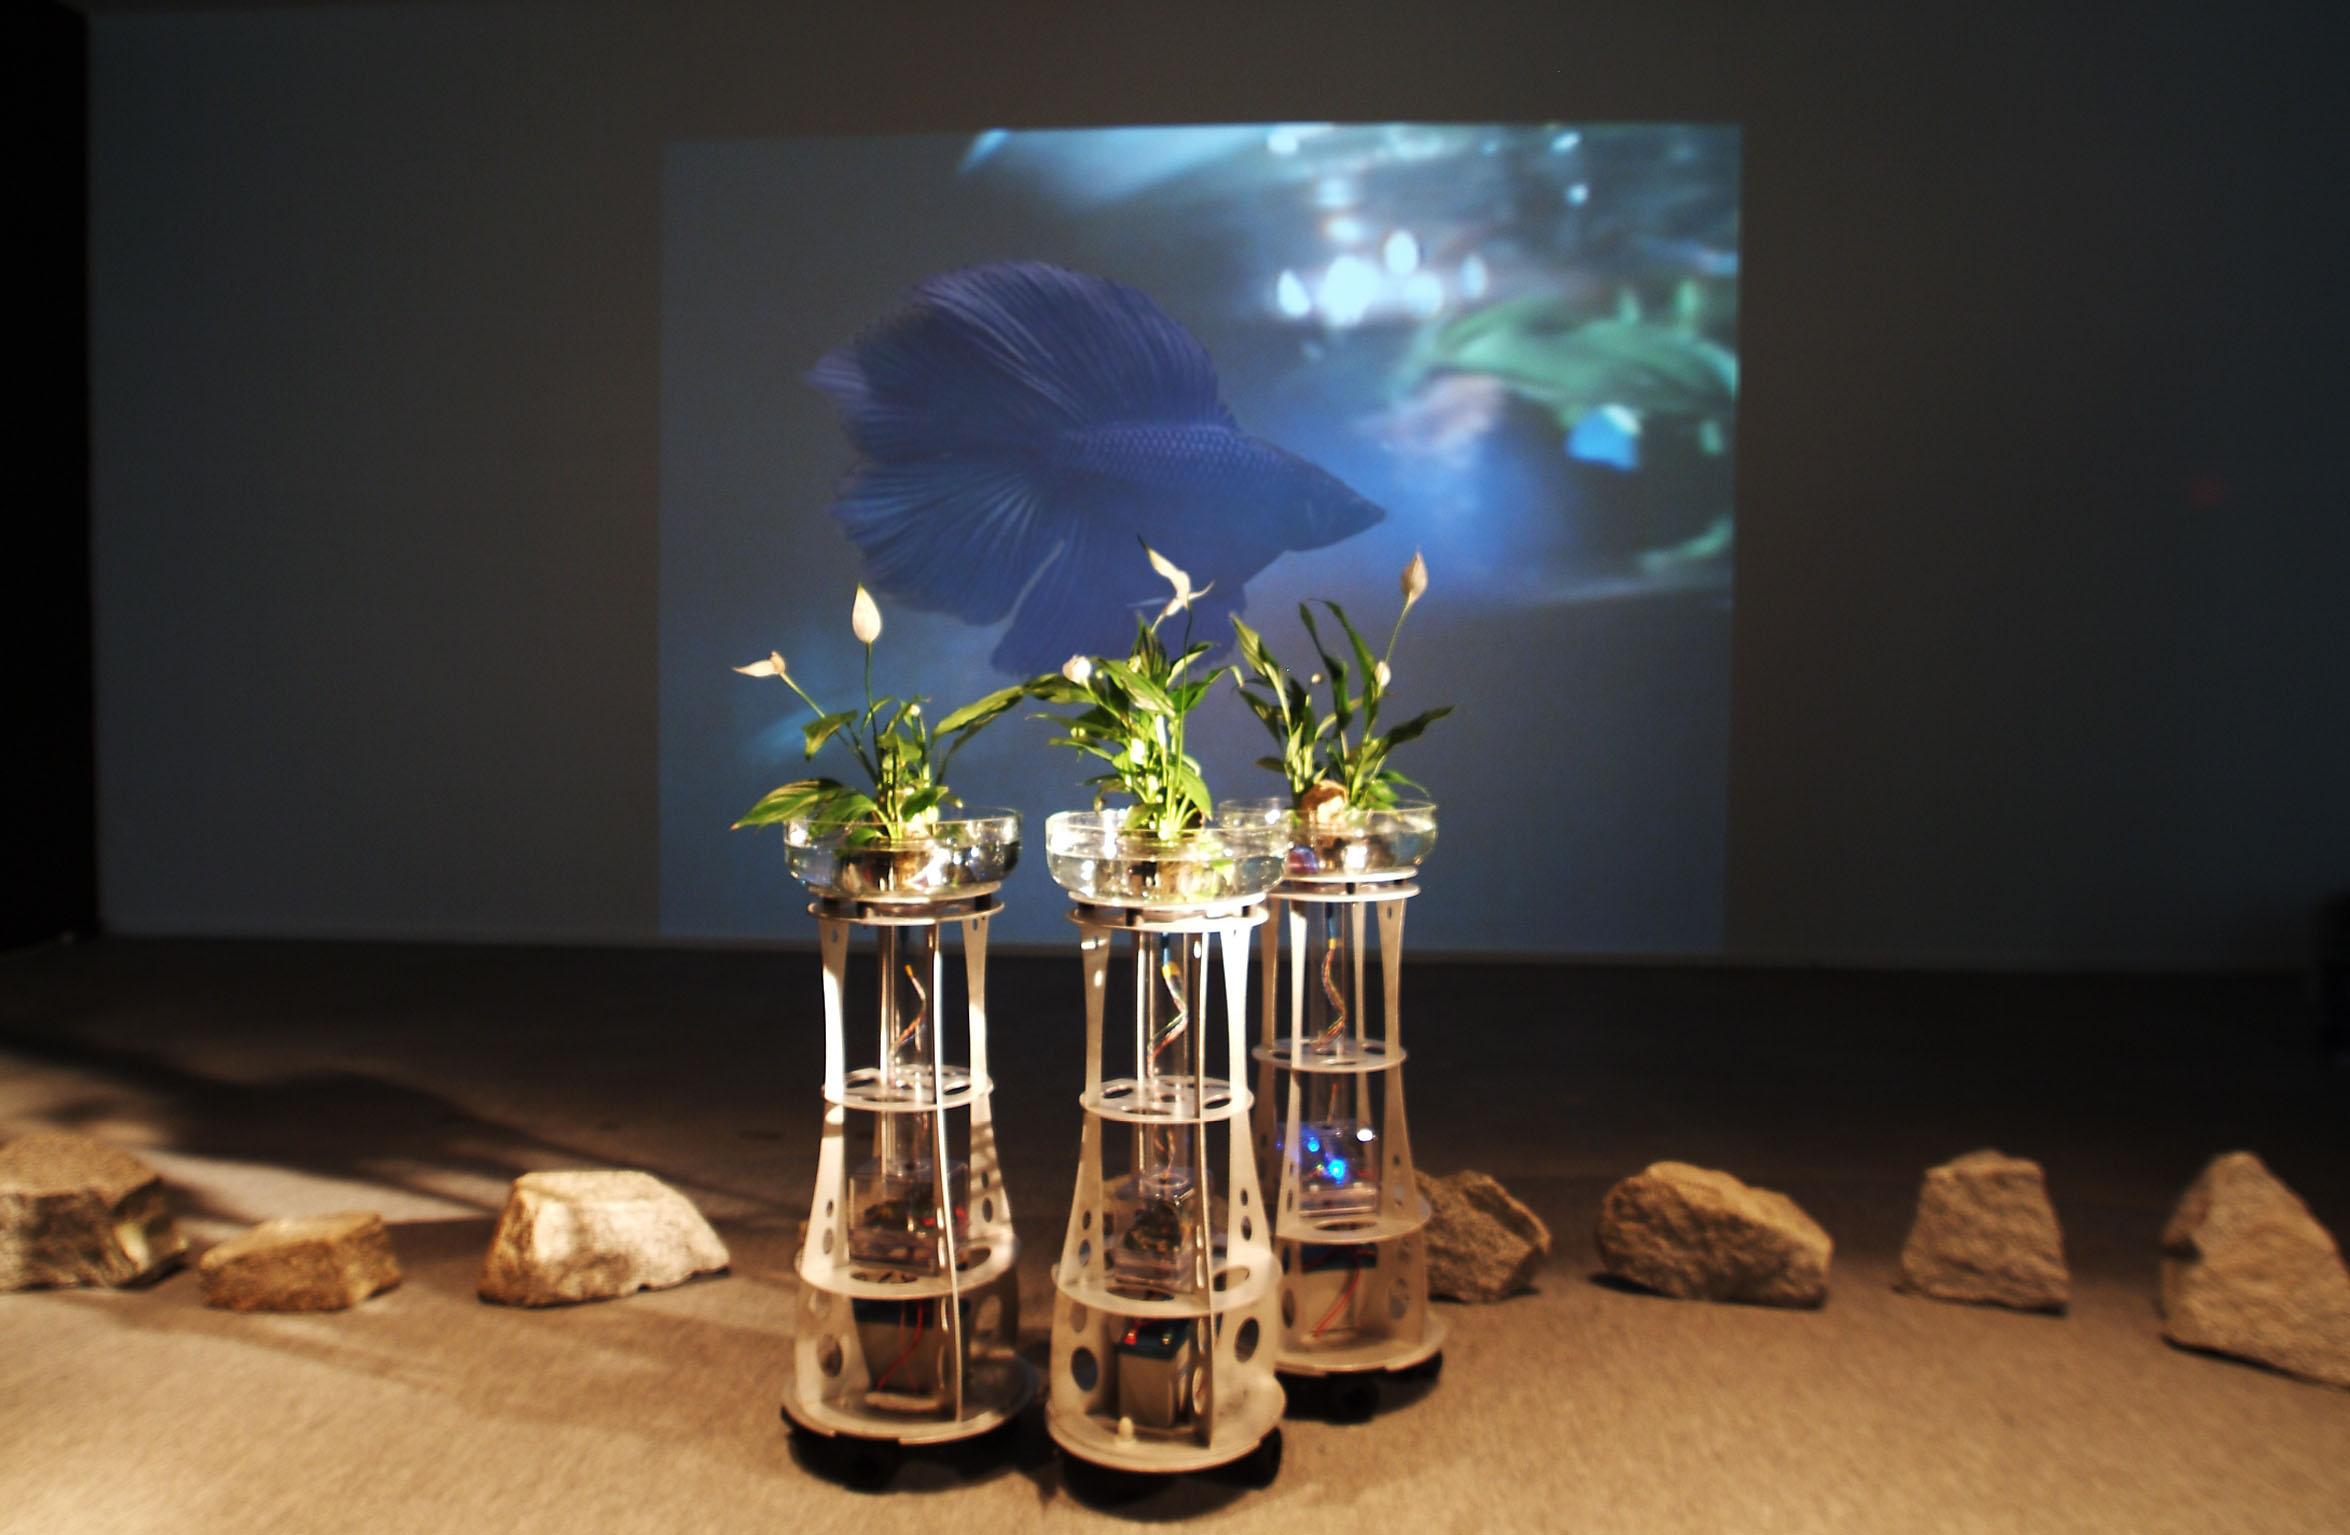 Augmented Fish Reality Ken Rinaldo